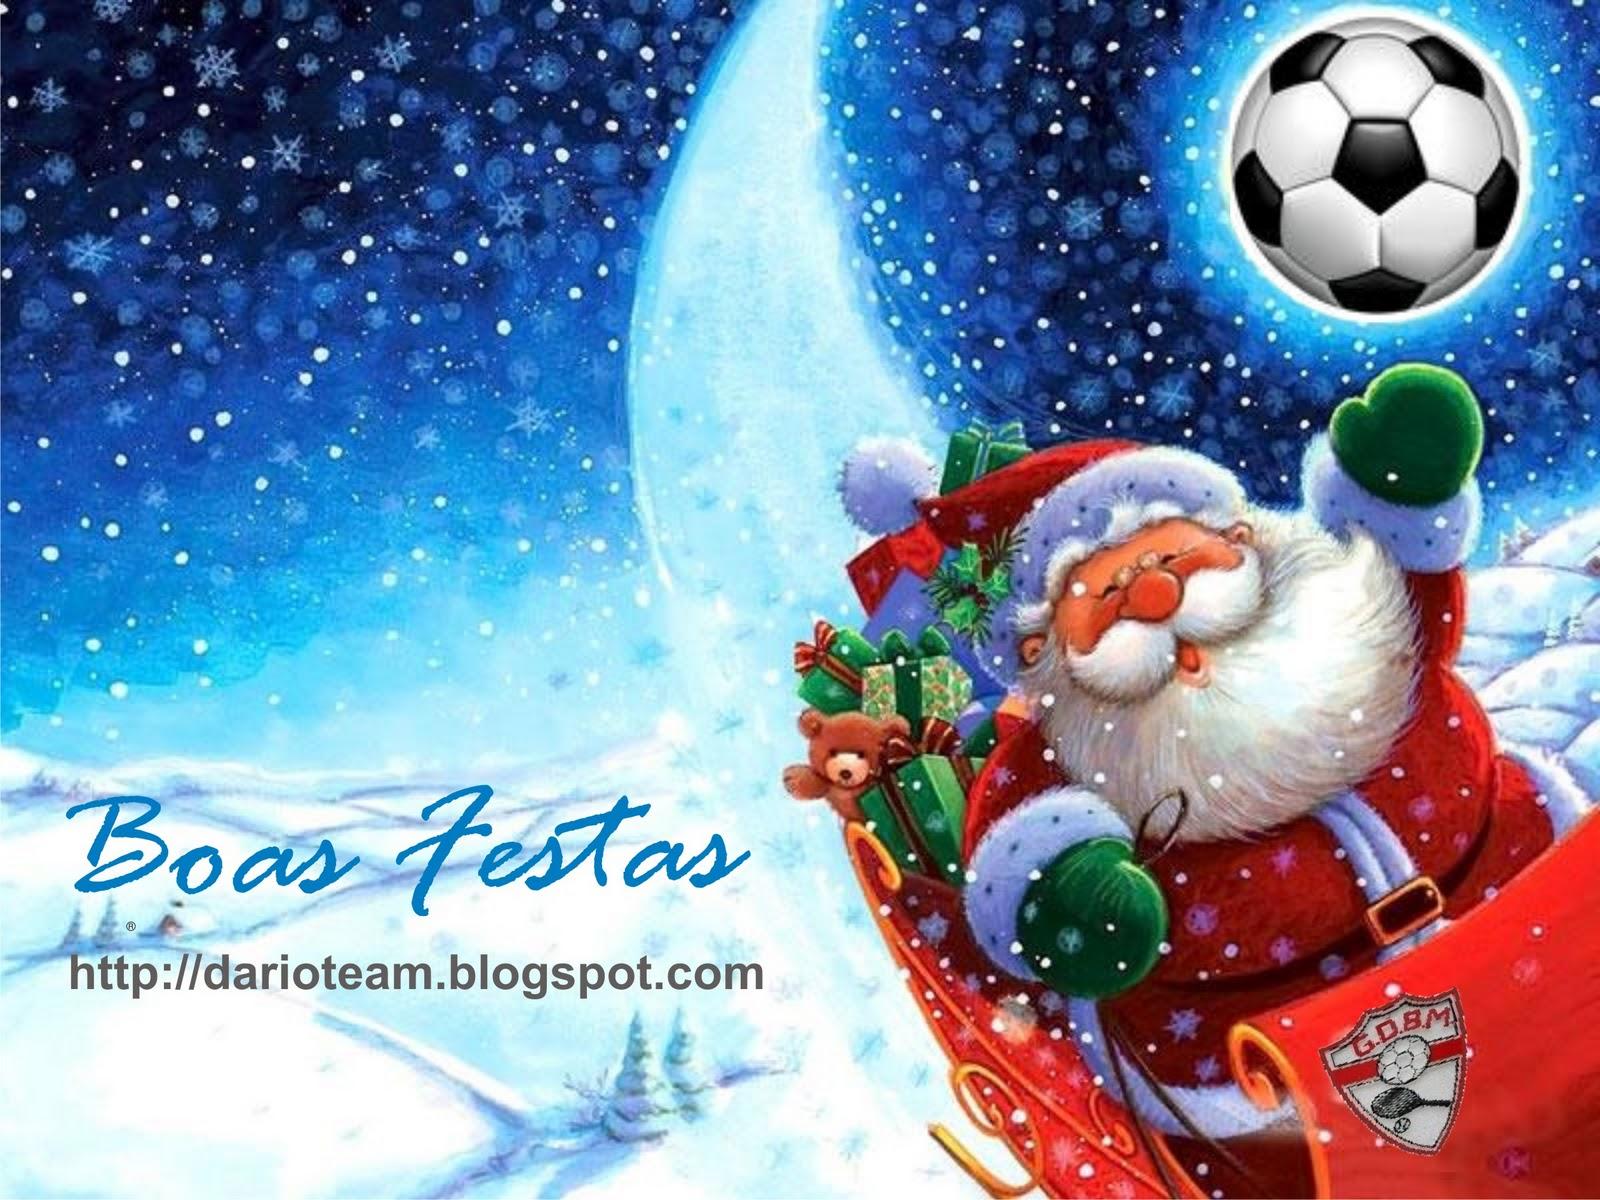 http://2.bp.blogspot.com/-J3VfCjL7vis/Tu5ScfPDOXI/AAAAAAAANQA/G0jGxCmujjQ/s1600/Boas+Festas+Darioteam+131209.JPG